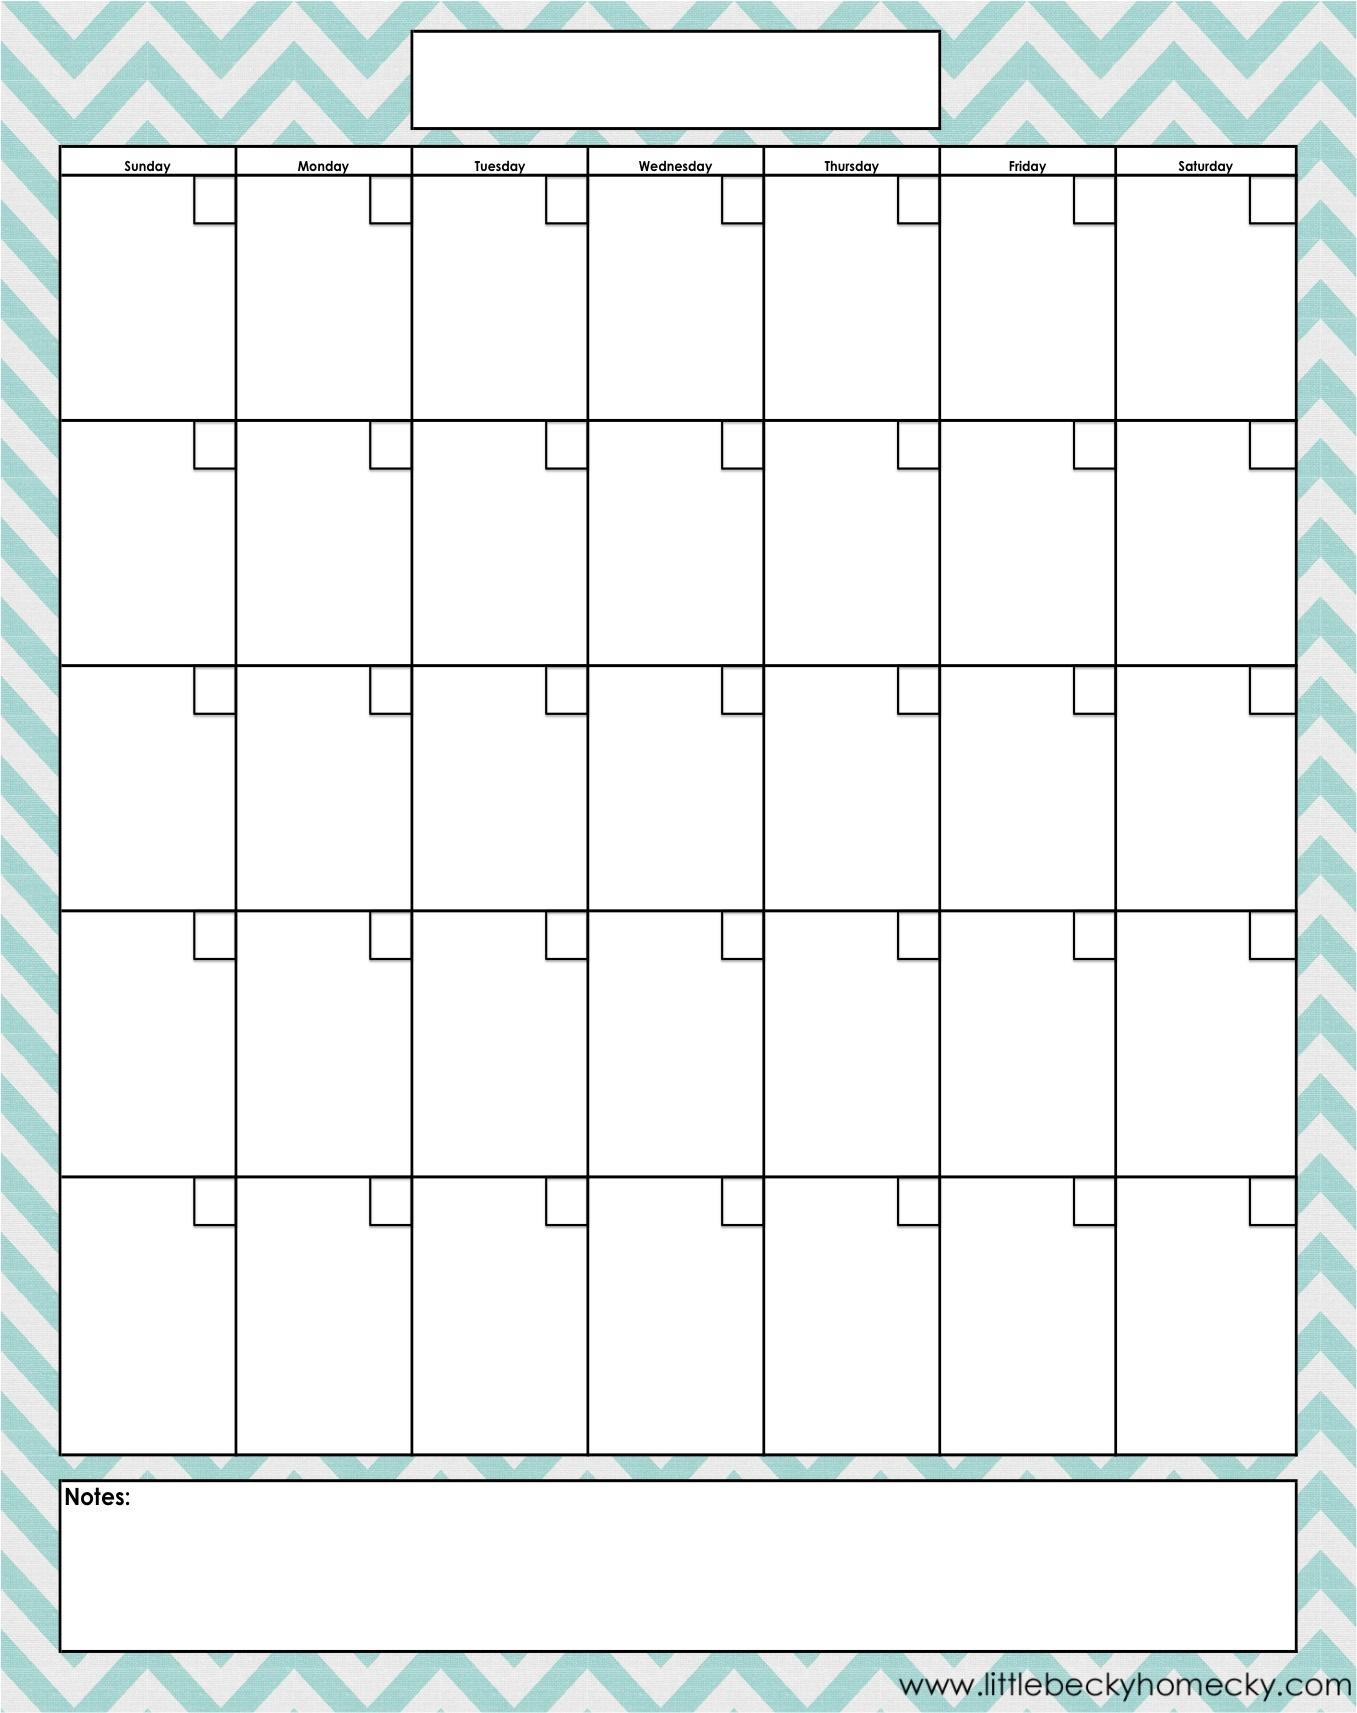 Blank Monthly Calendars To Print Free Calendar 2018 Printable with Full Size Printable Monthly Calendars